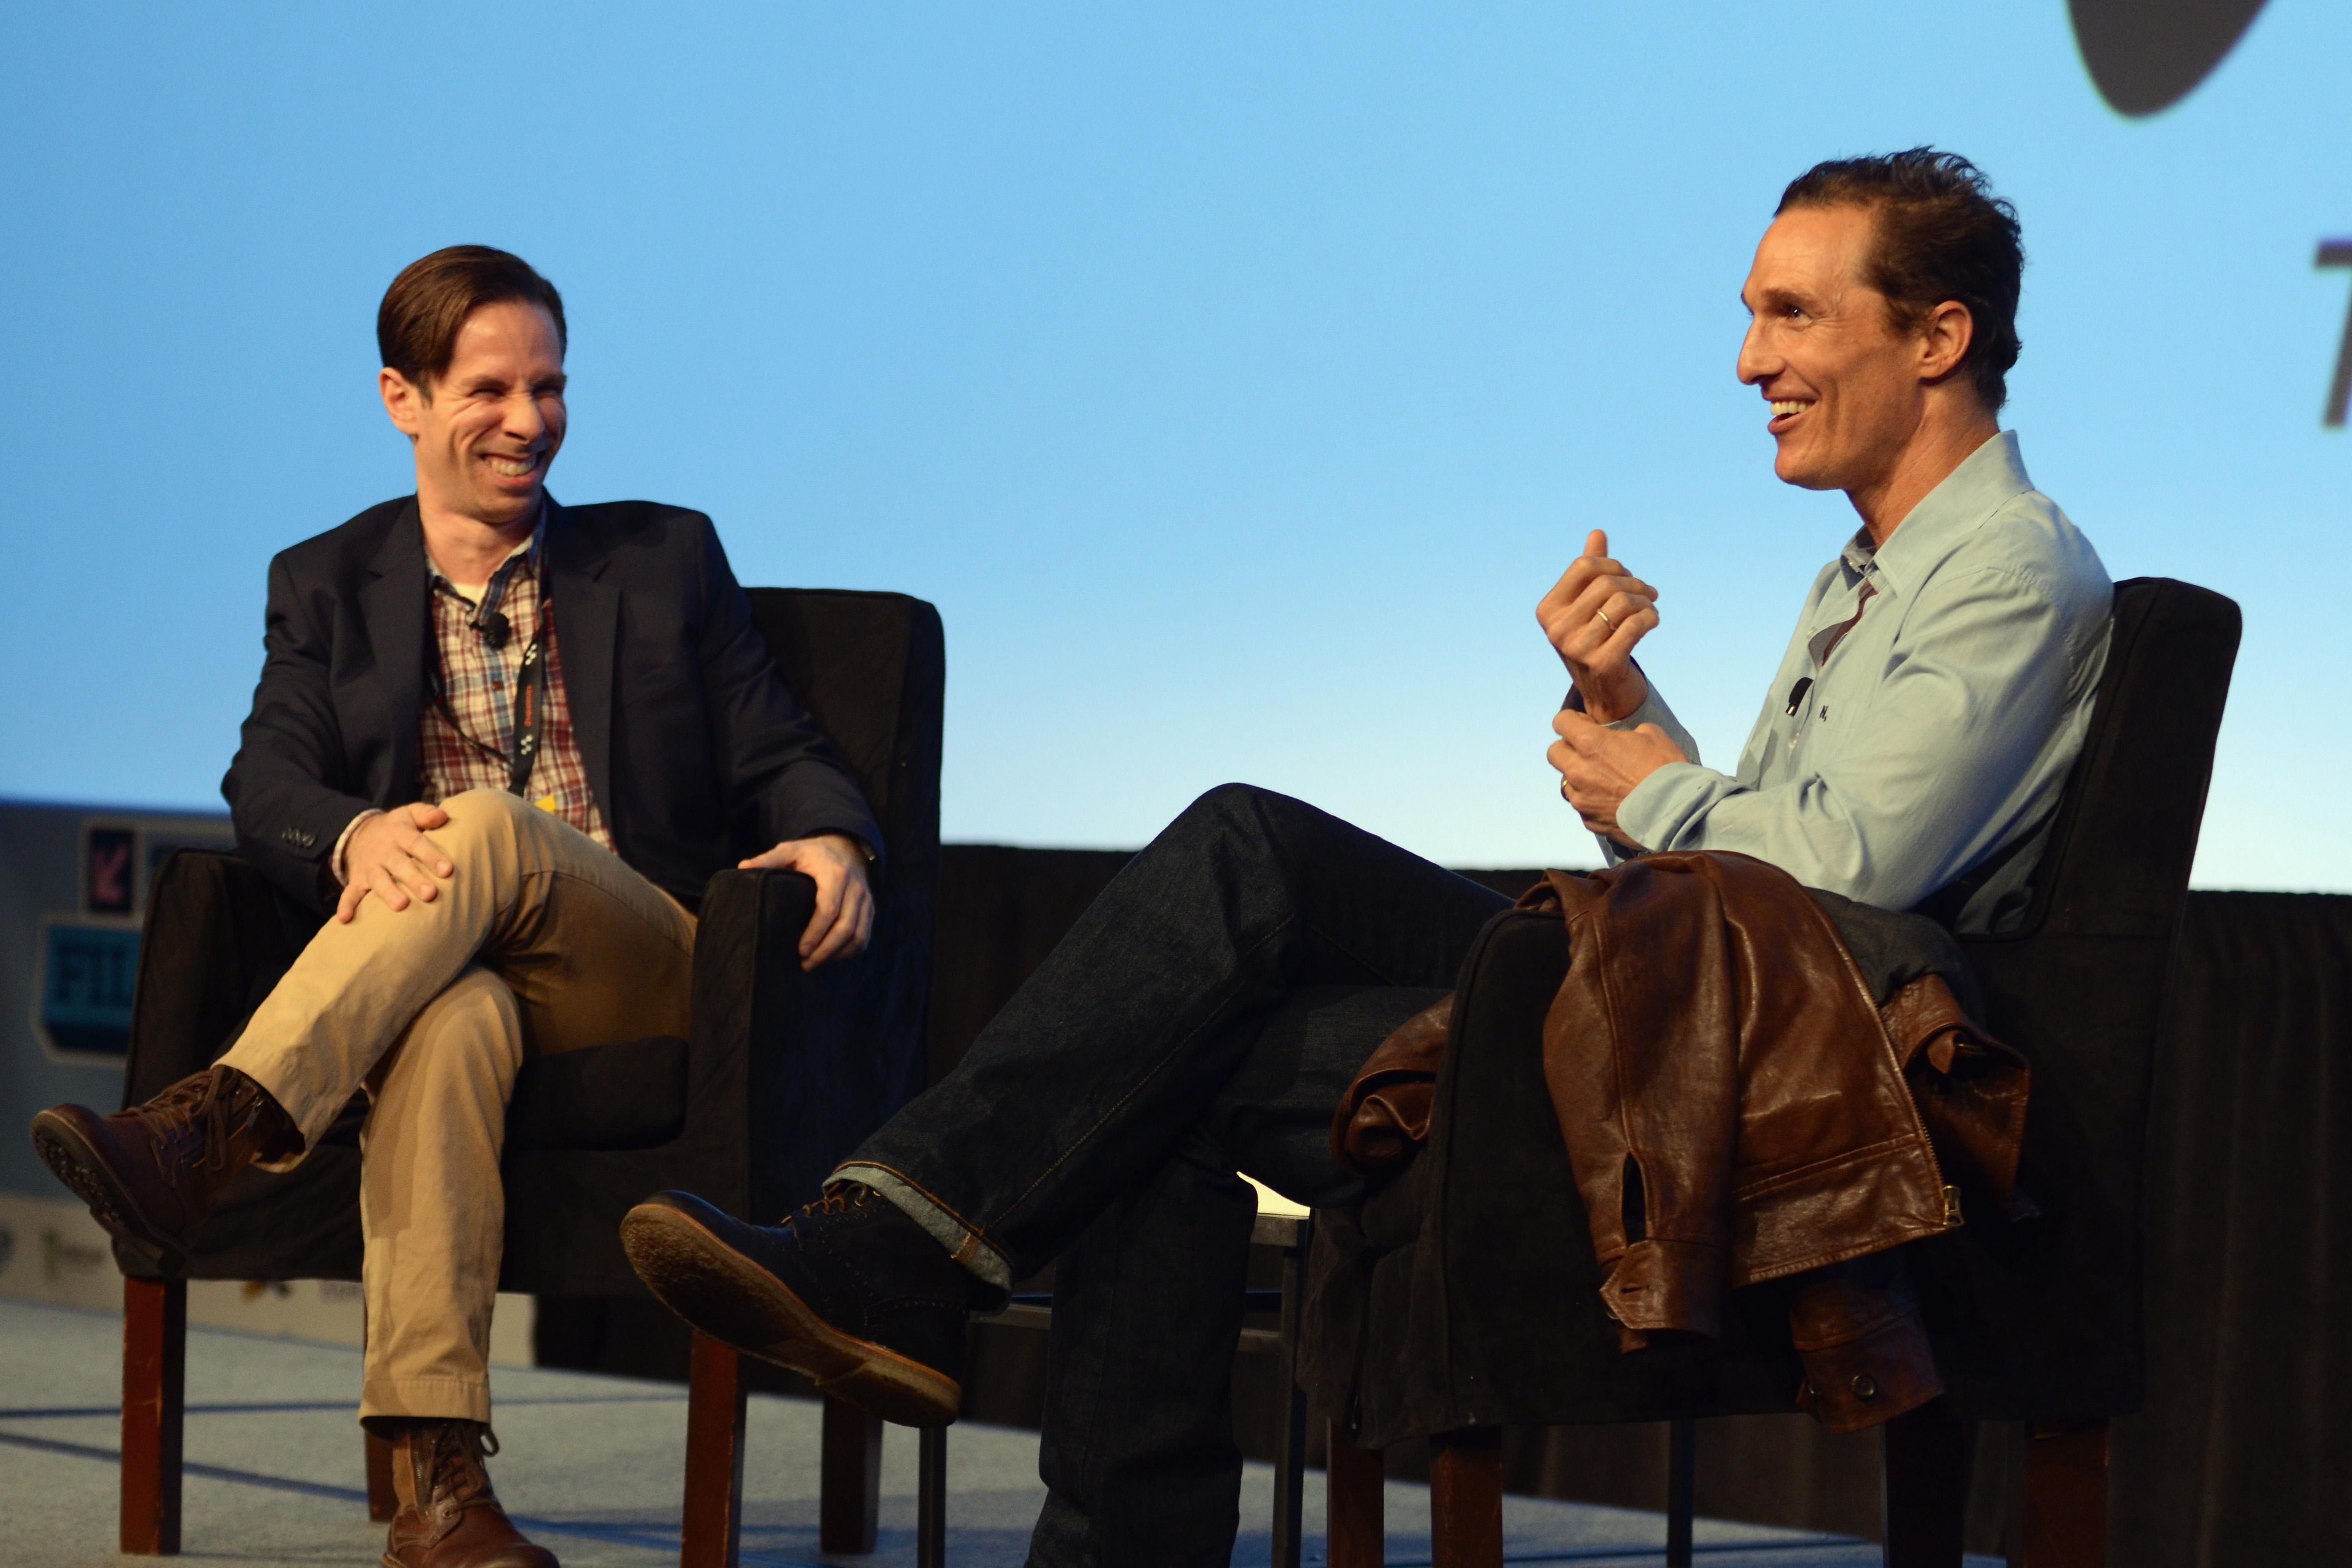 Matthew McConaughey had a sit-down with Scott Foundas at SXSW.